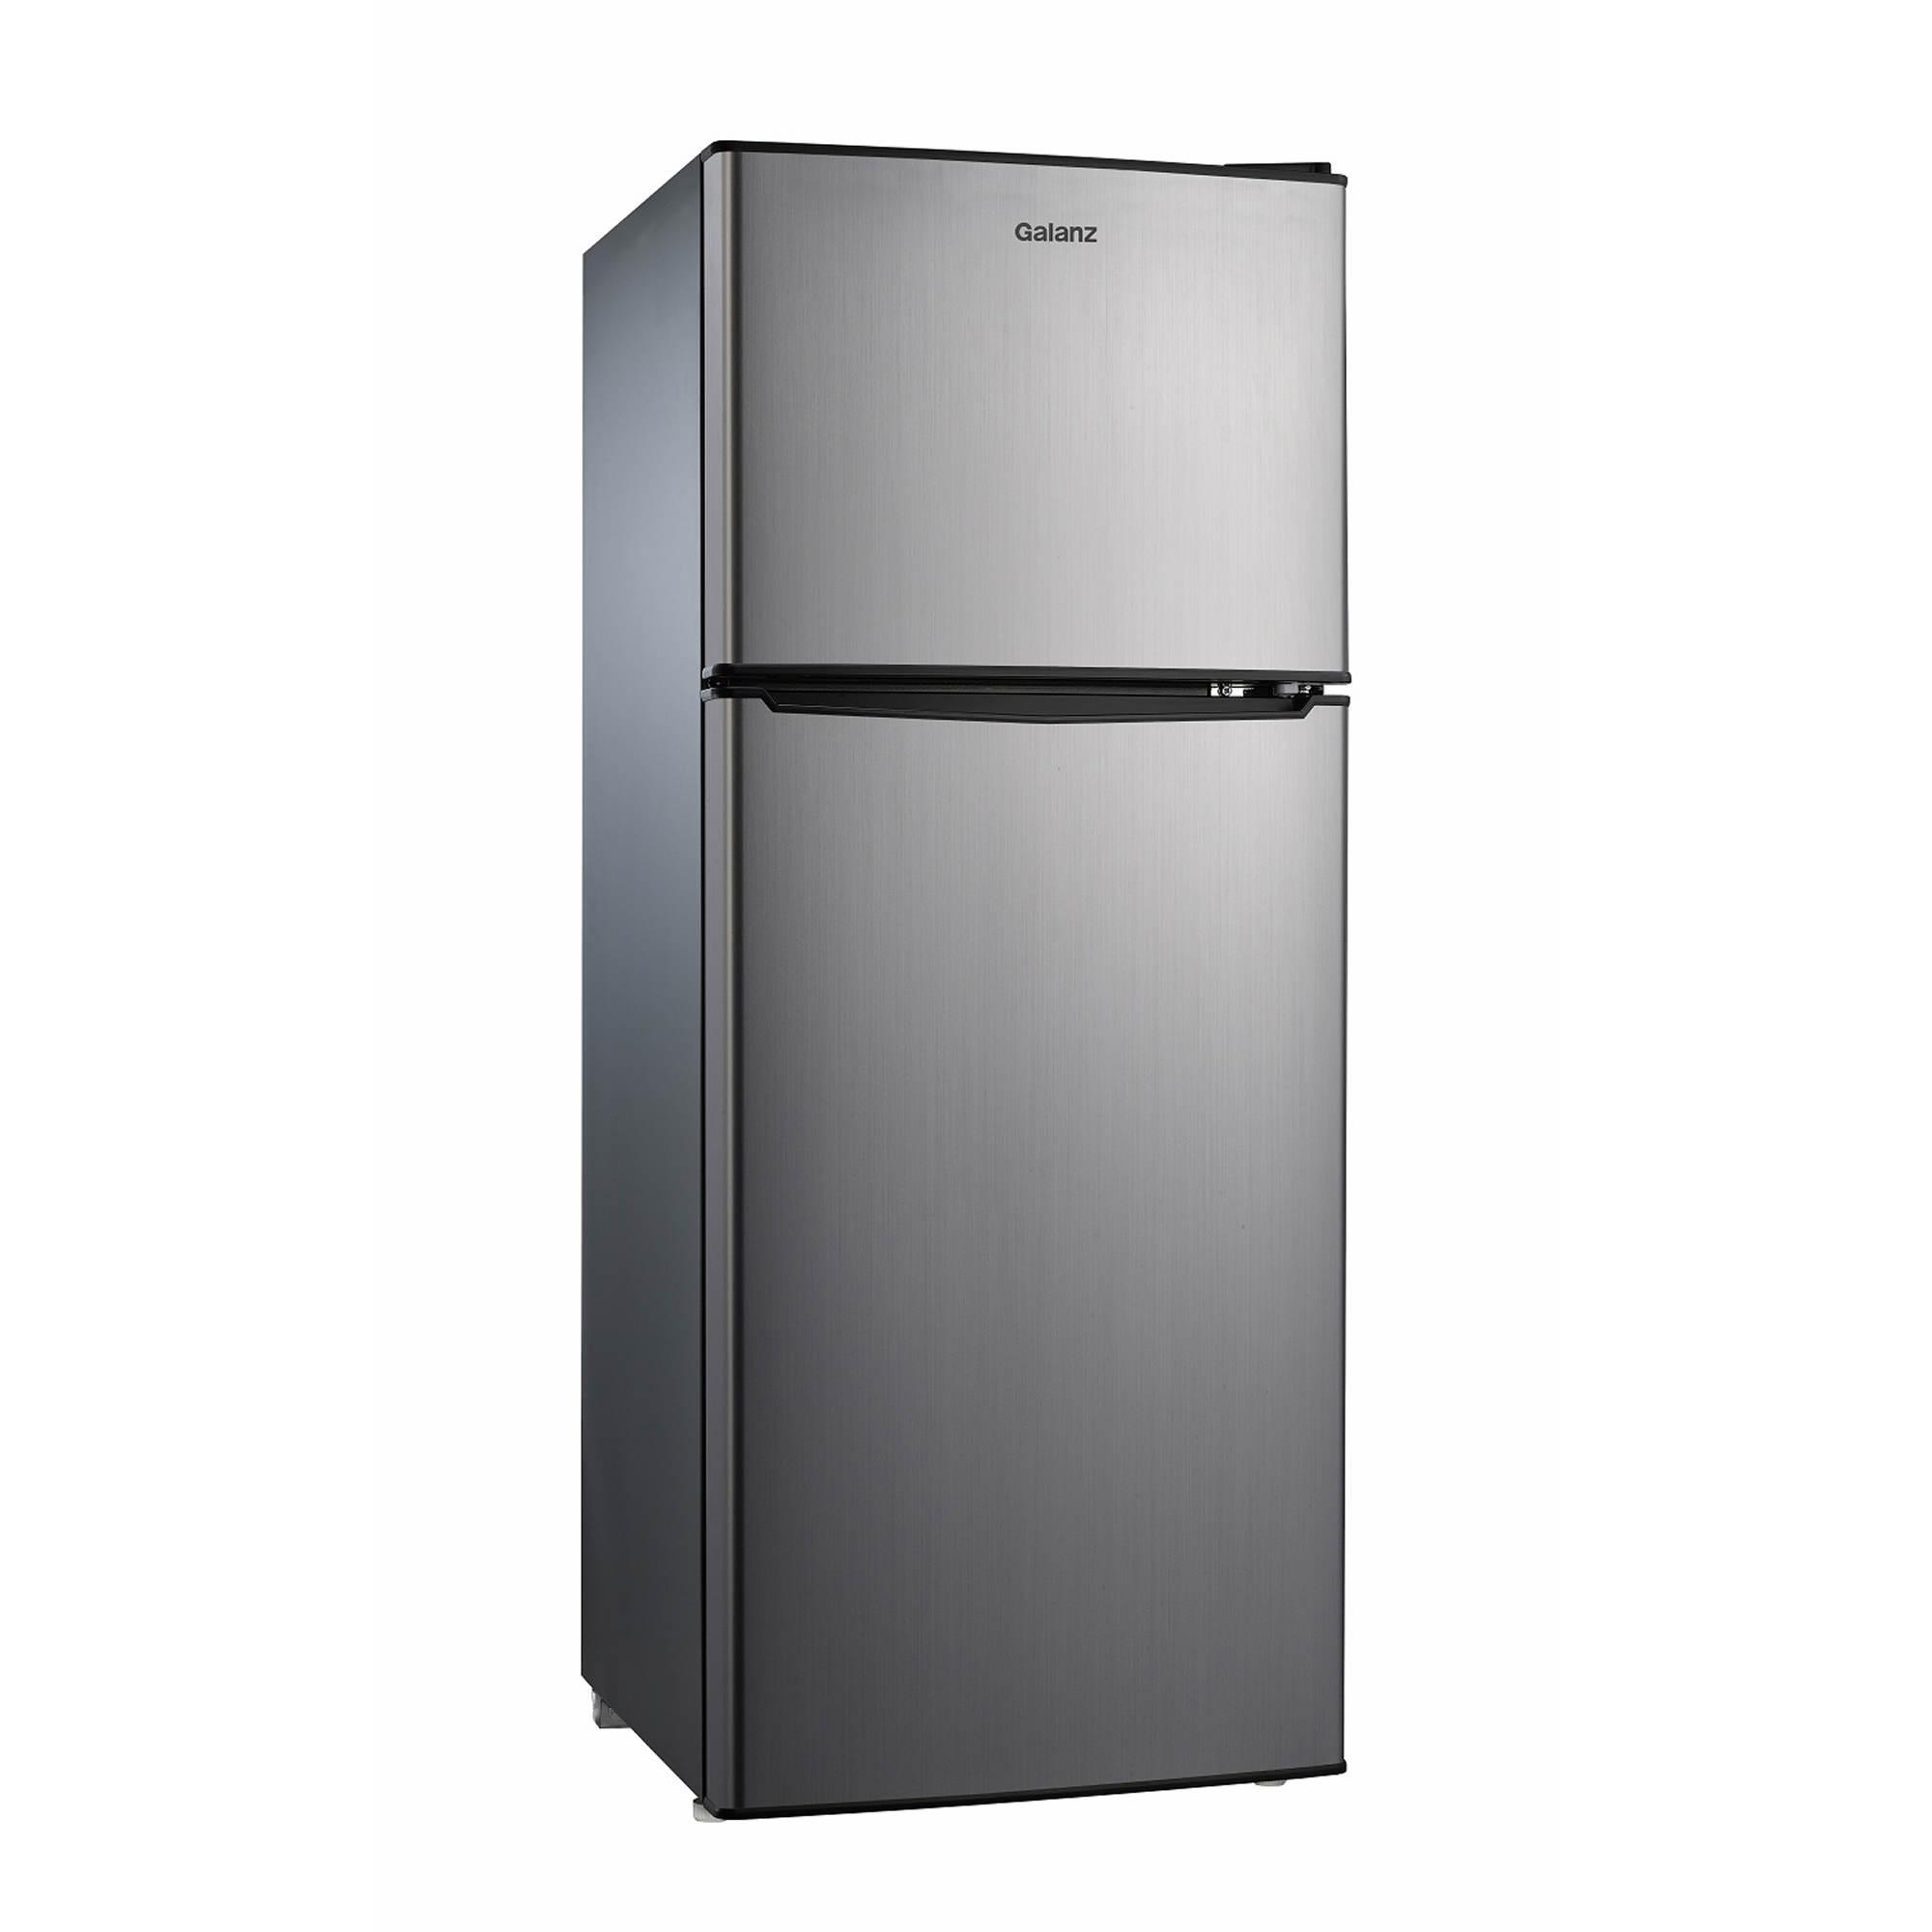 Galanz 4.6-Cu.-Ft. Dual-Door Stainless Refrigerator